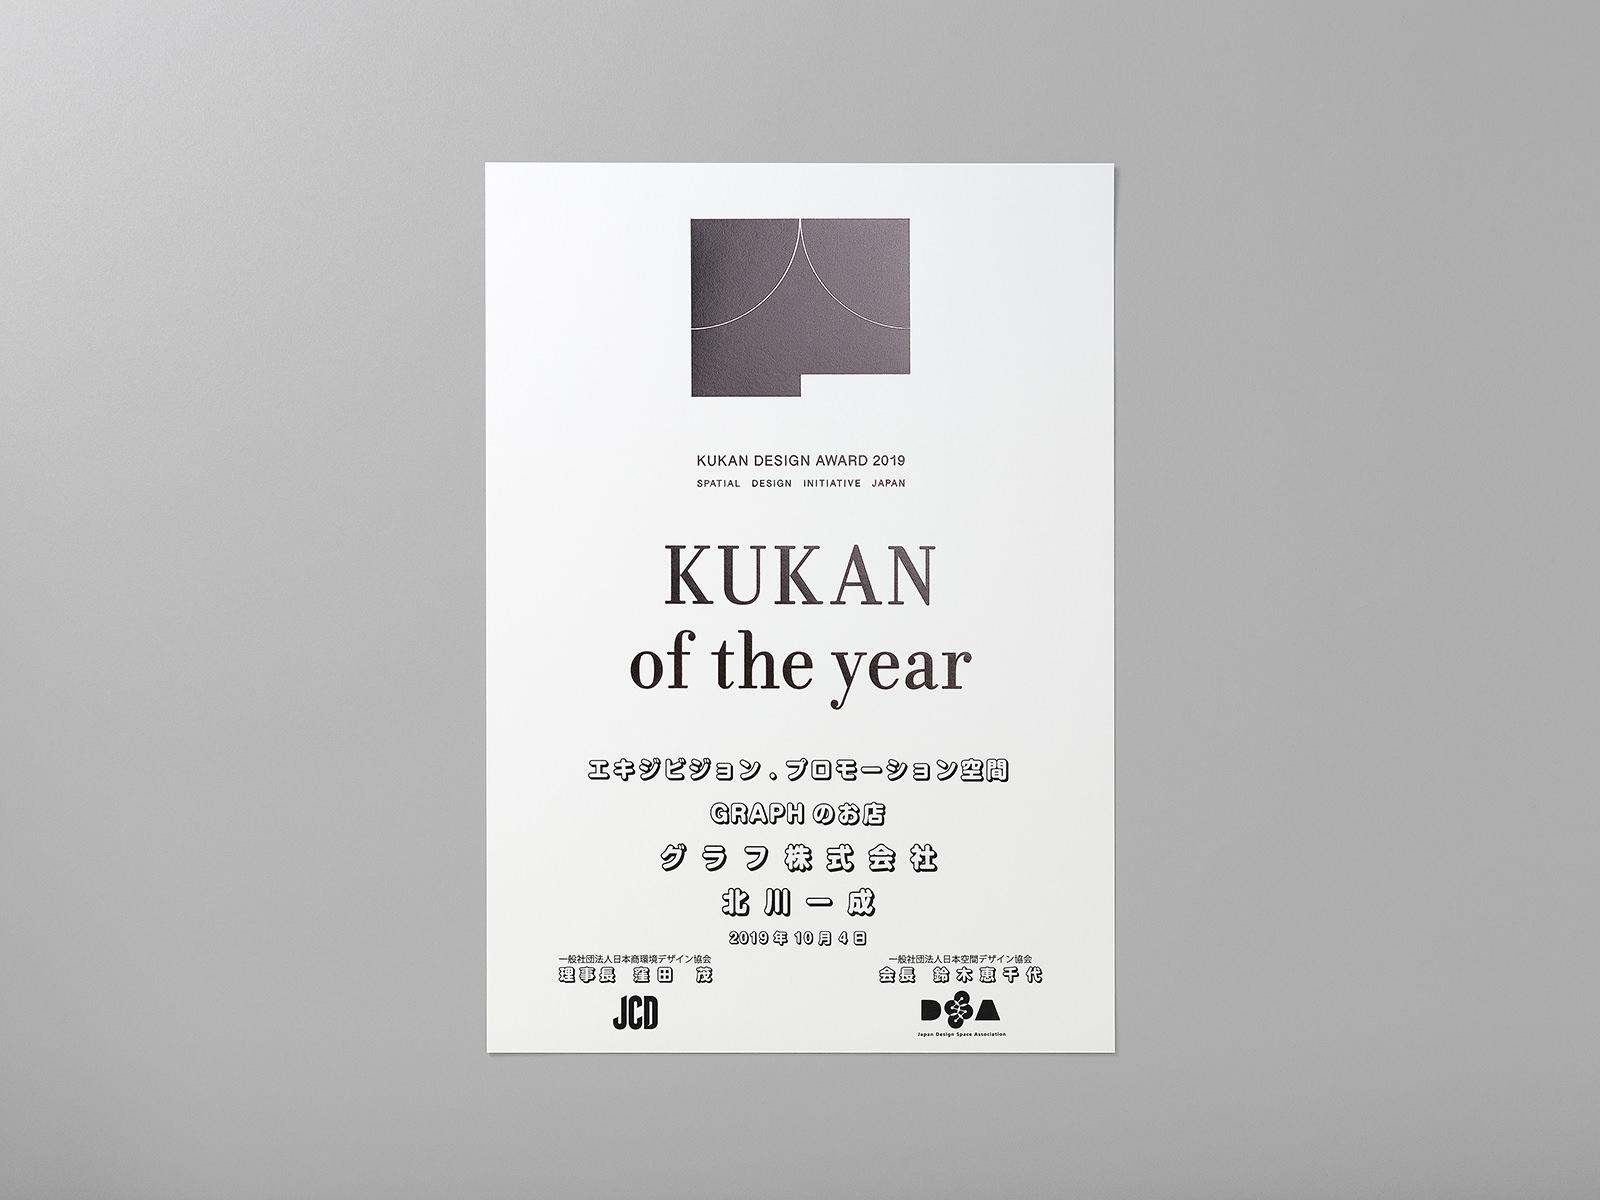 works_kukandesignaward2019_06